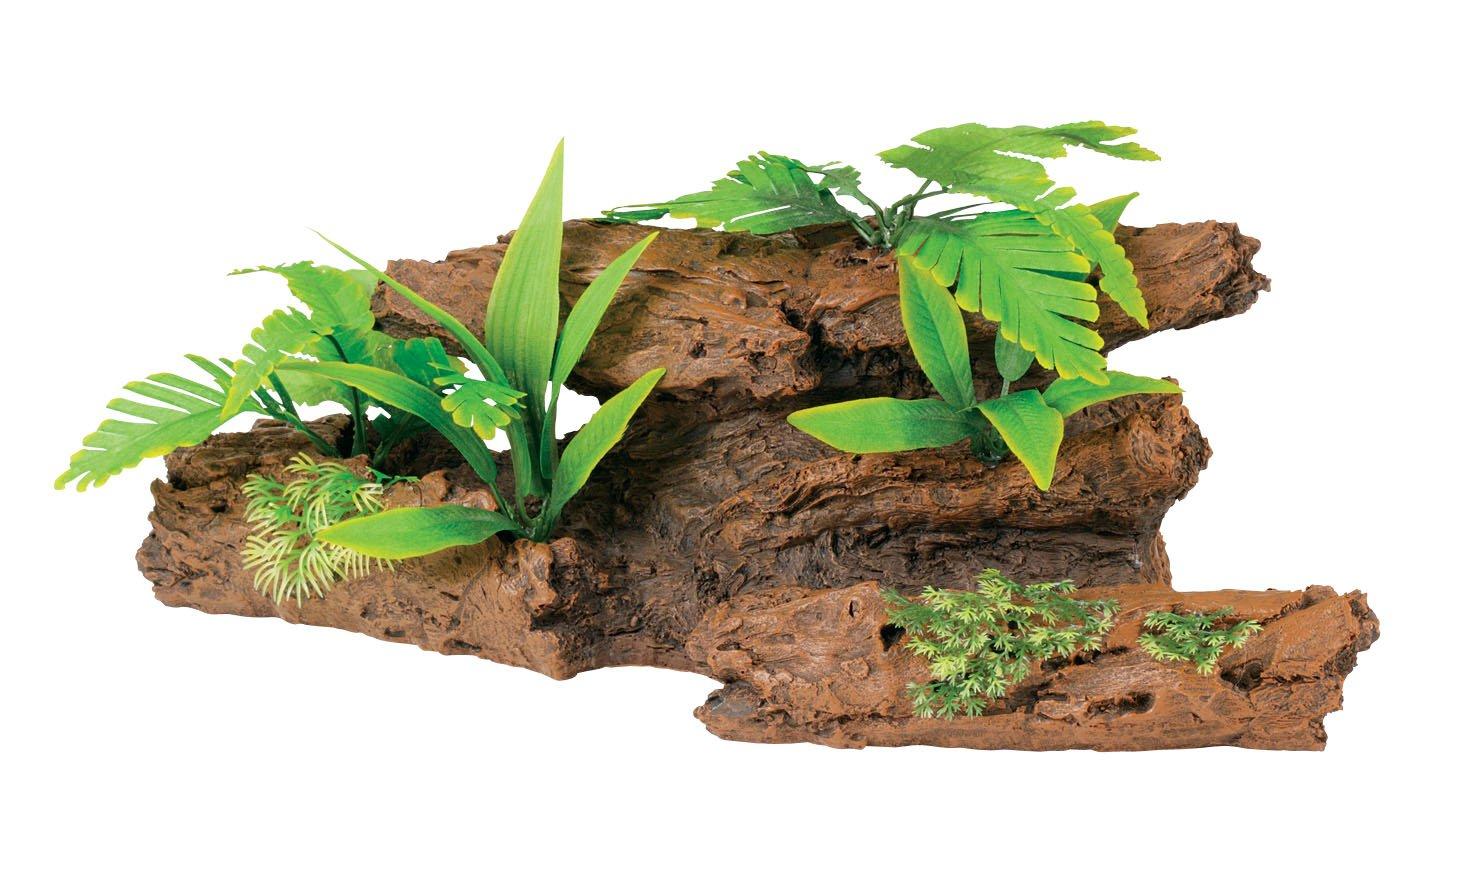 Marina Naturals Malaysian Driftwood with Plants, Extra Large by Marina